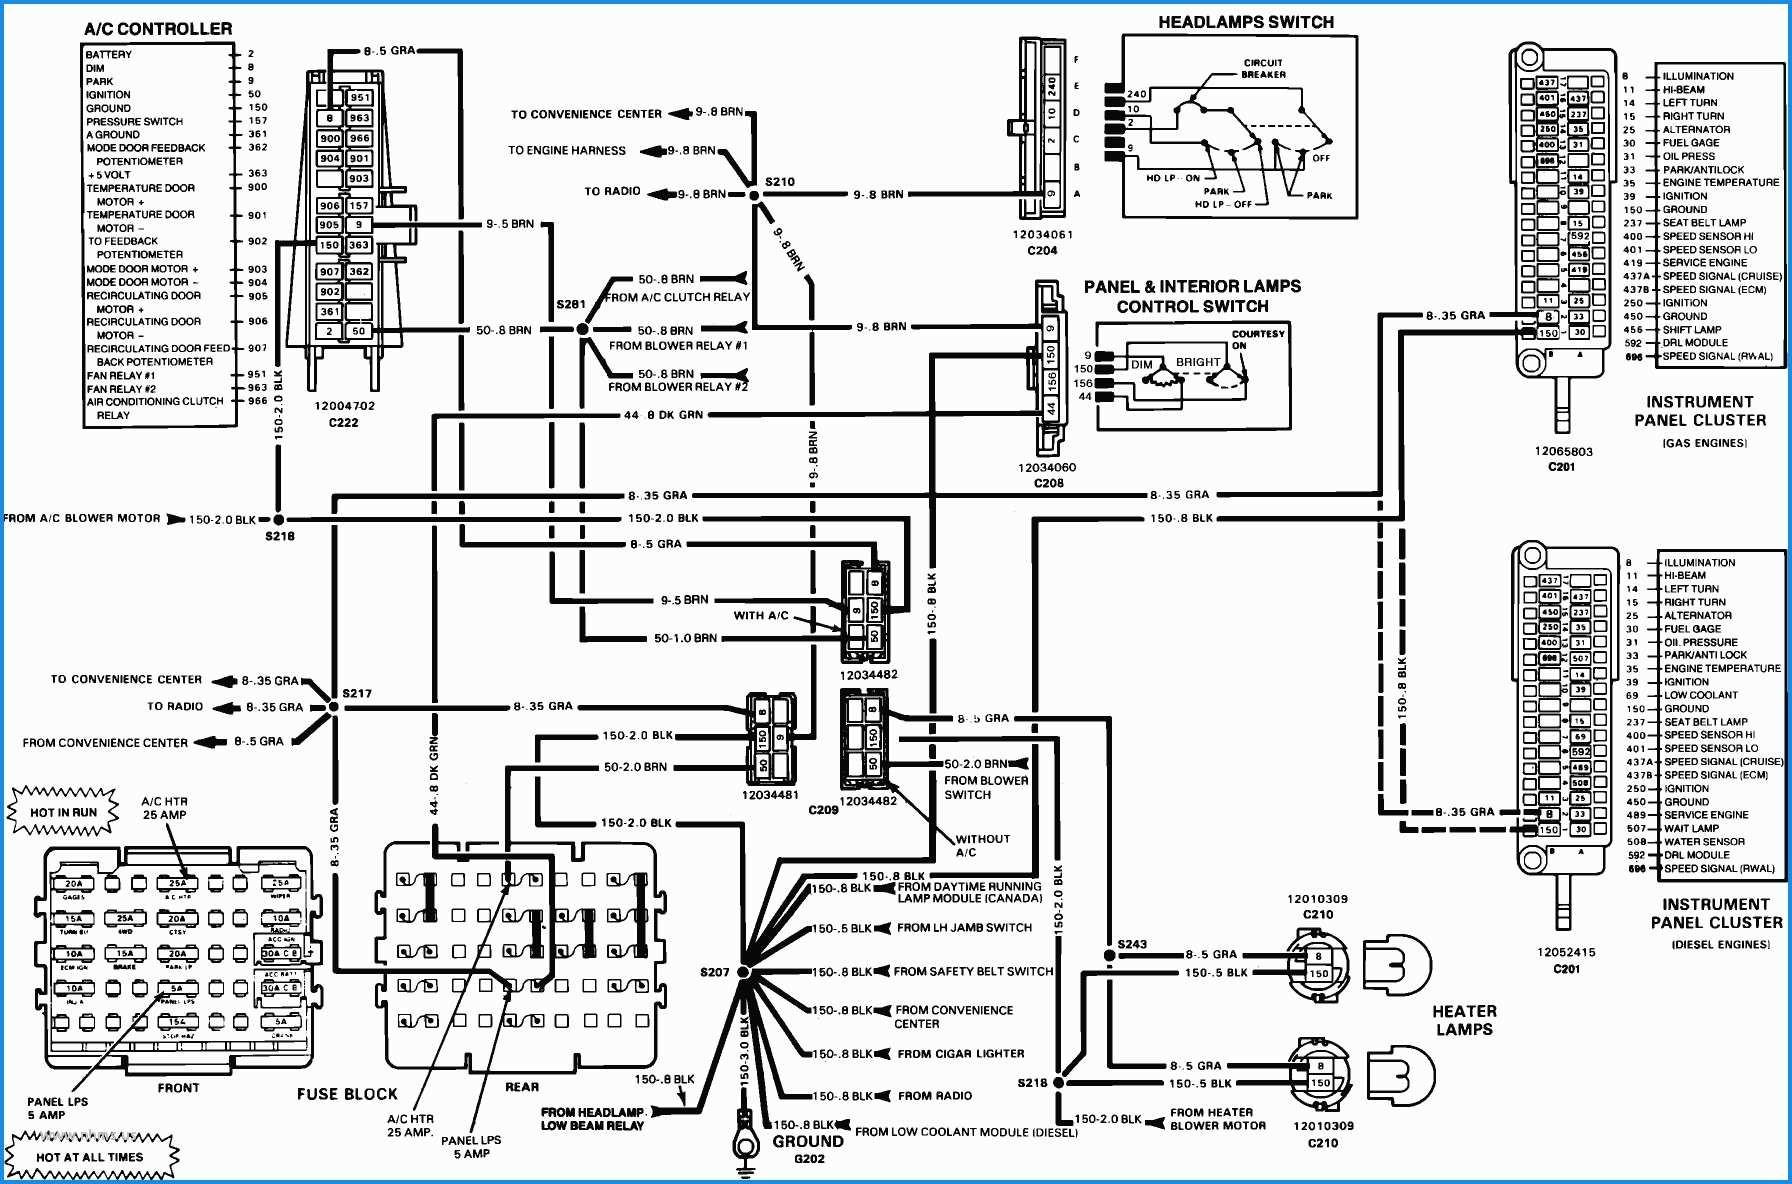 2008 Gmc 25000 Brake Lamp Diagram Diagram] 1984 Gmc High Sierra Wiring Diagram Full Version Hd Of 2008 Gmc 25000 Brake Lamp Diagram